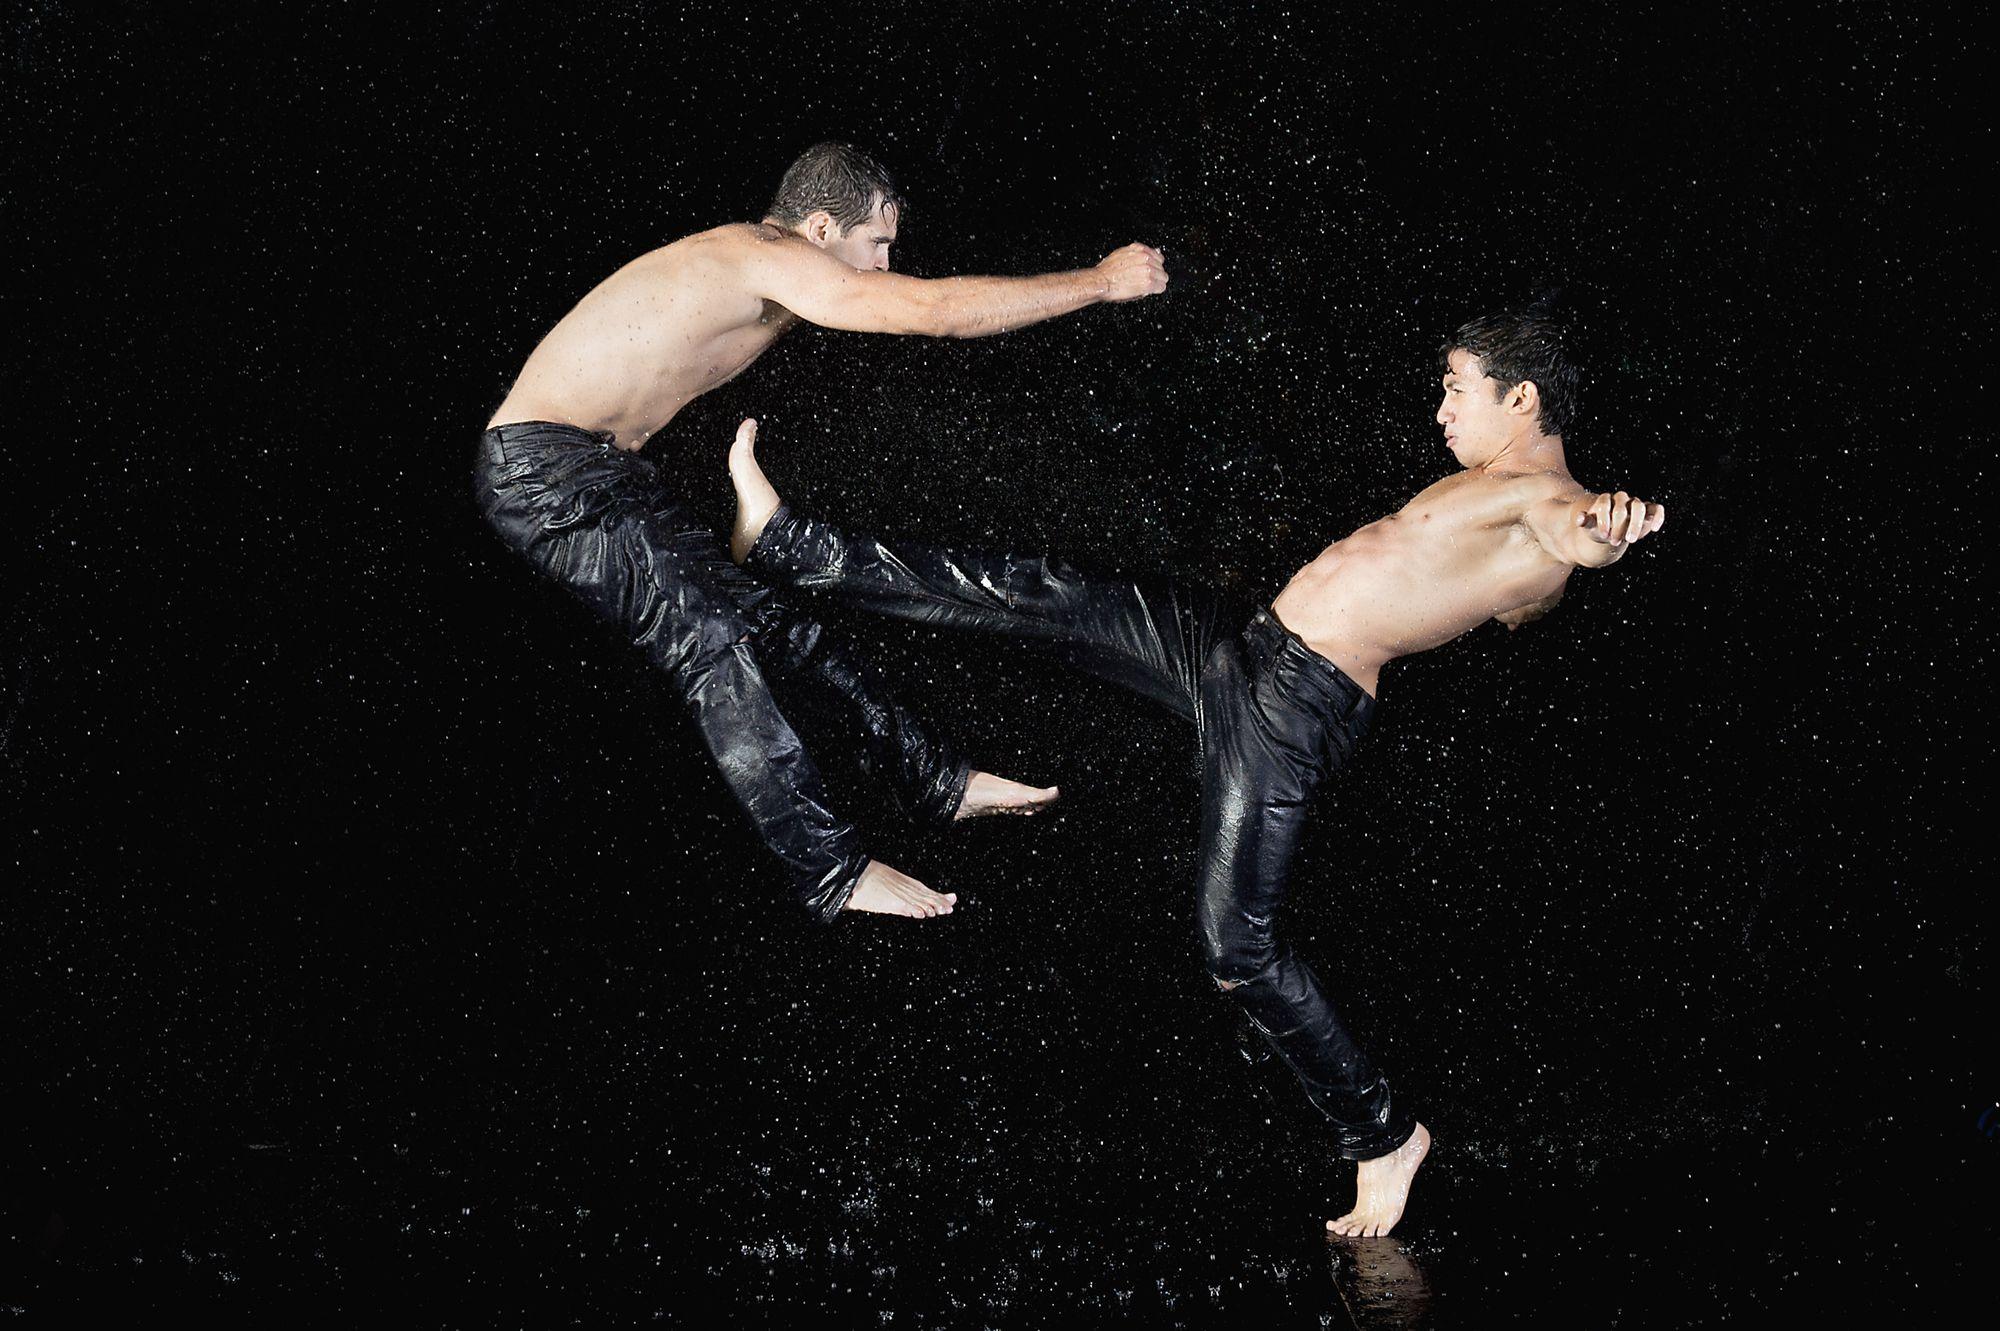 Vinny Silva and Raihan Baqui In Water by Cassandra